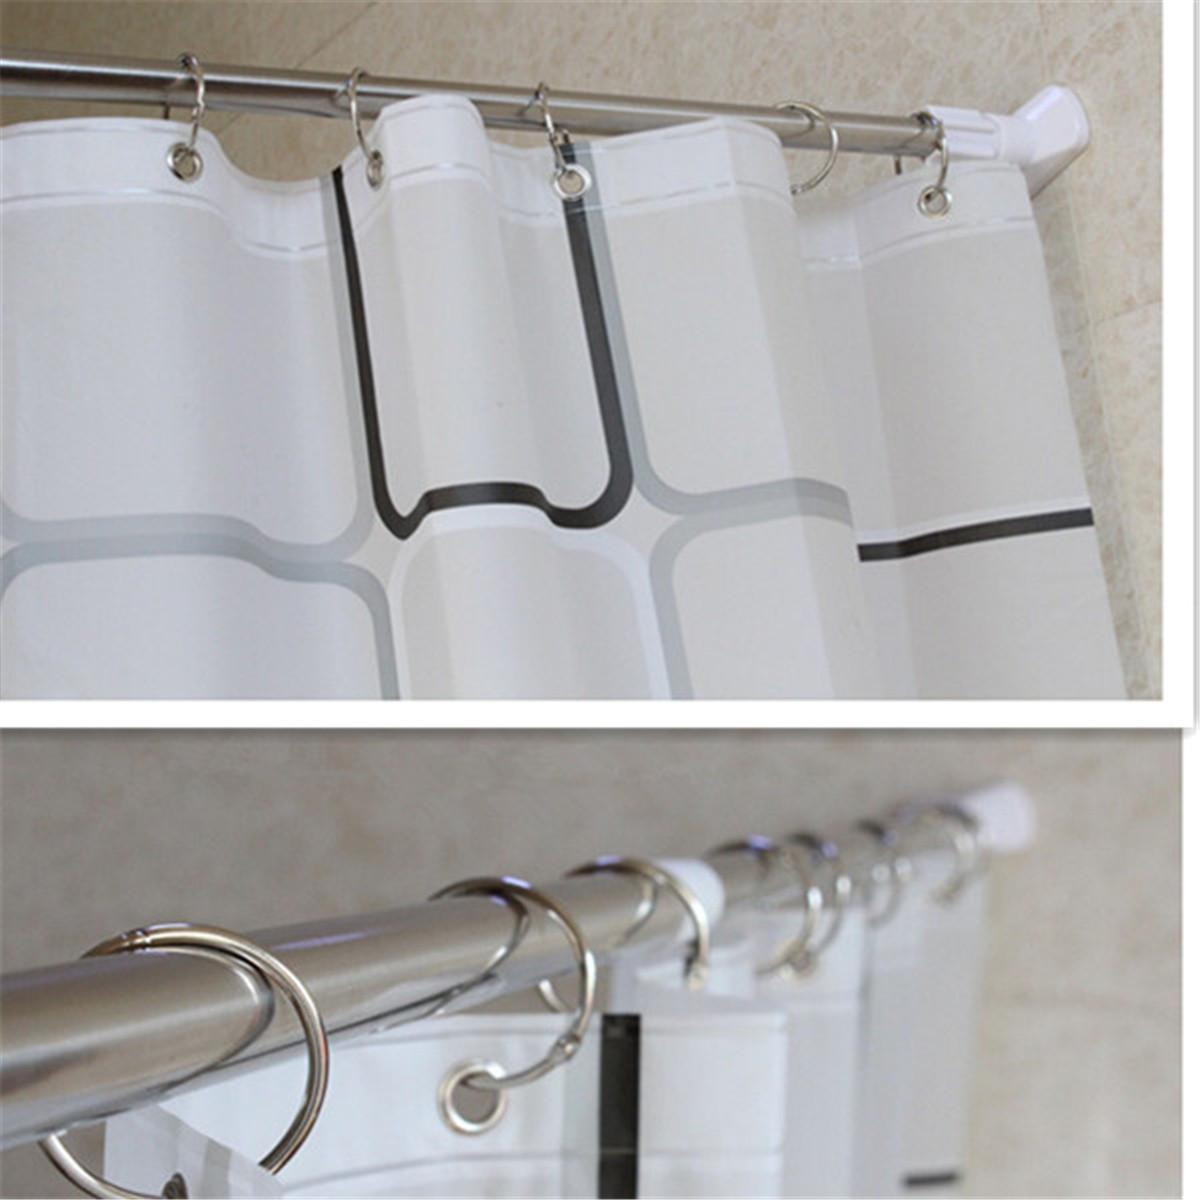 Bathroom Curtain Pole: Stainless Steel Adjustable Tension Door Bathroom Shower